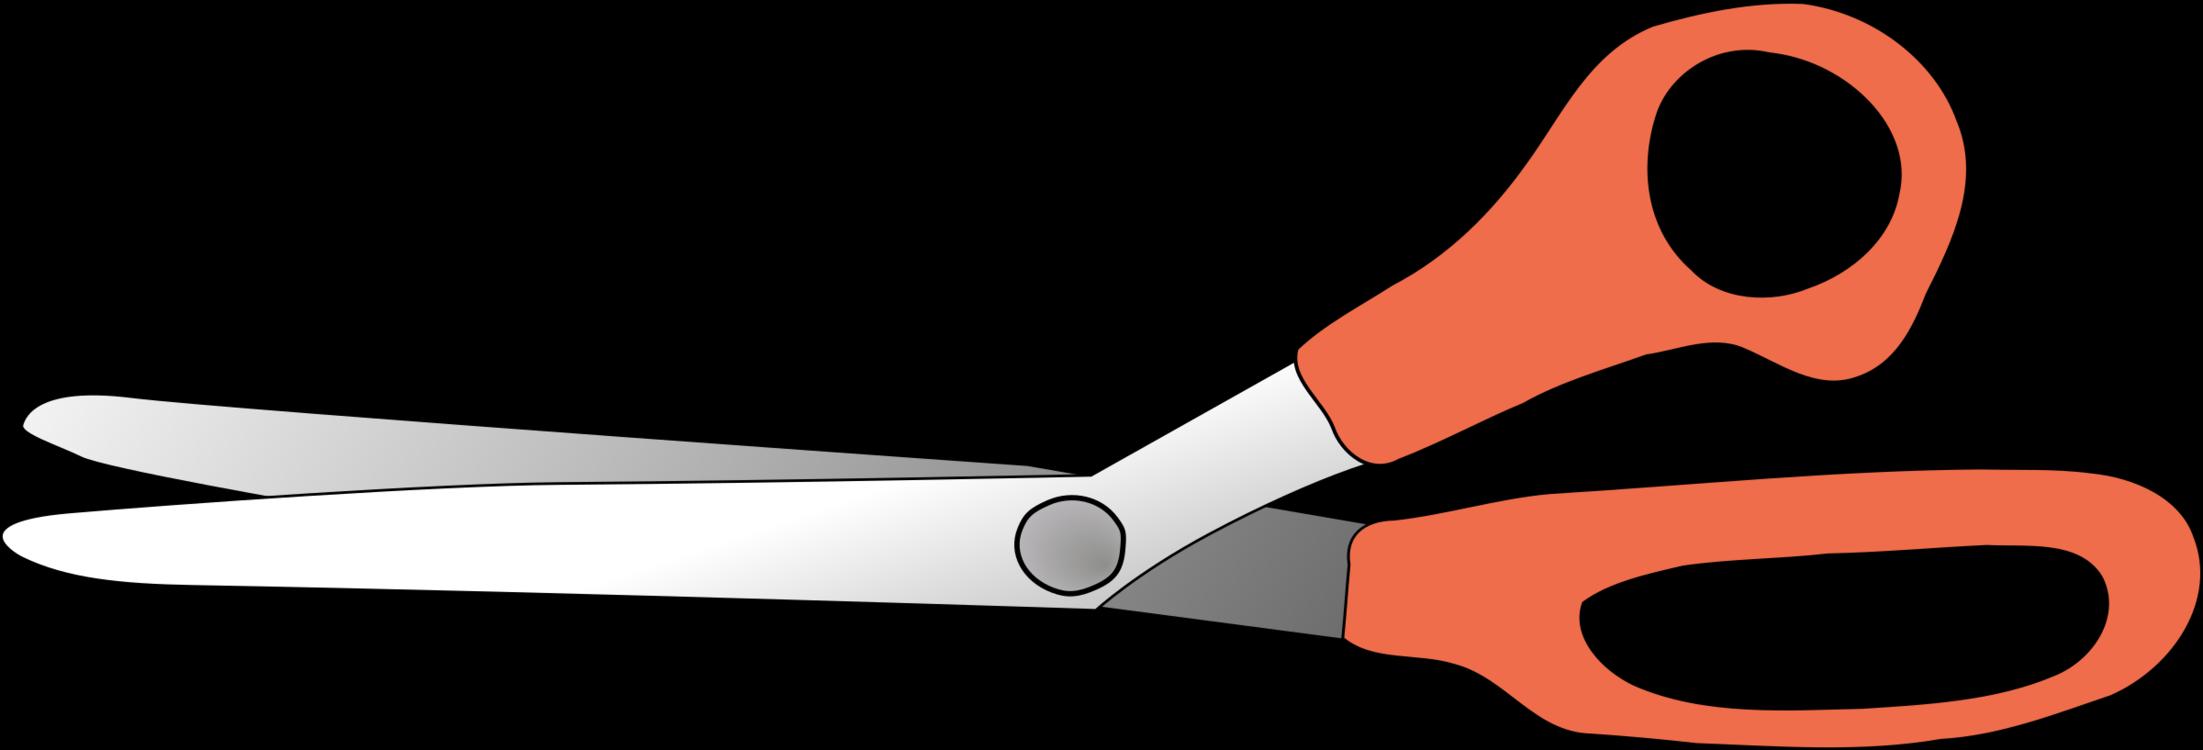 Angle,Wing,Tool